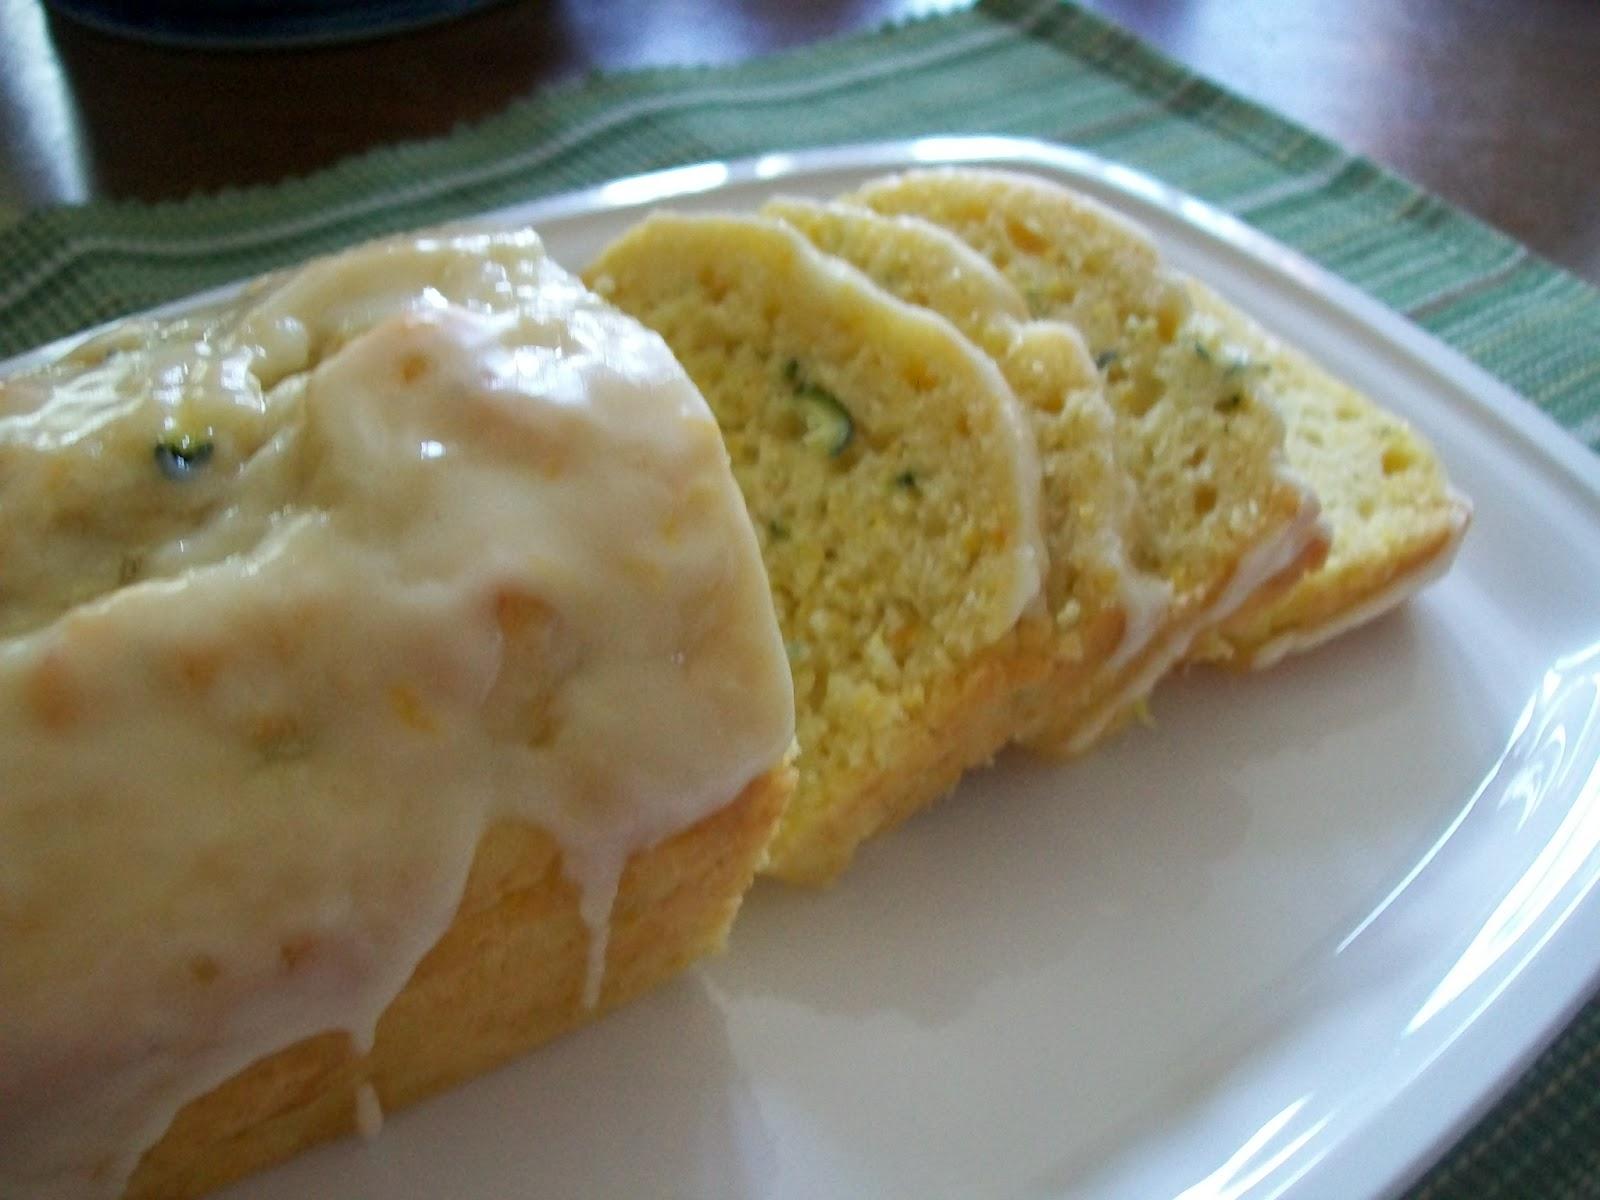 ... bread bread of the wild veldt bread glazed ham glazed key lime bread